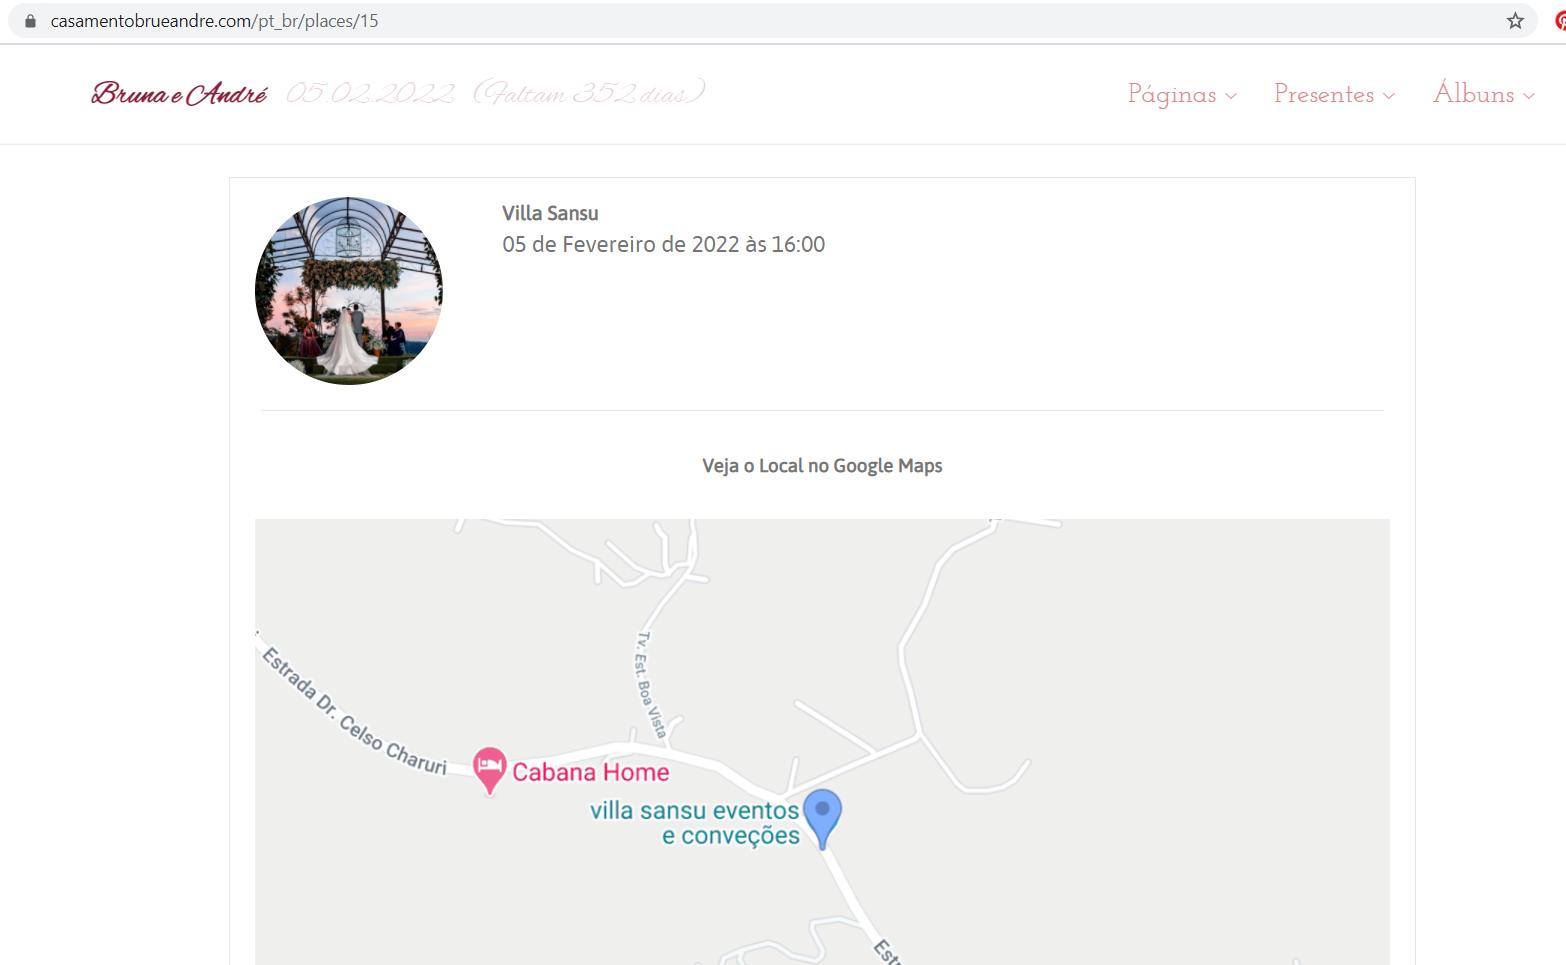 Site icasei - mapa do local